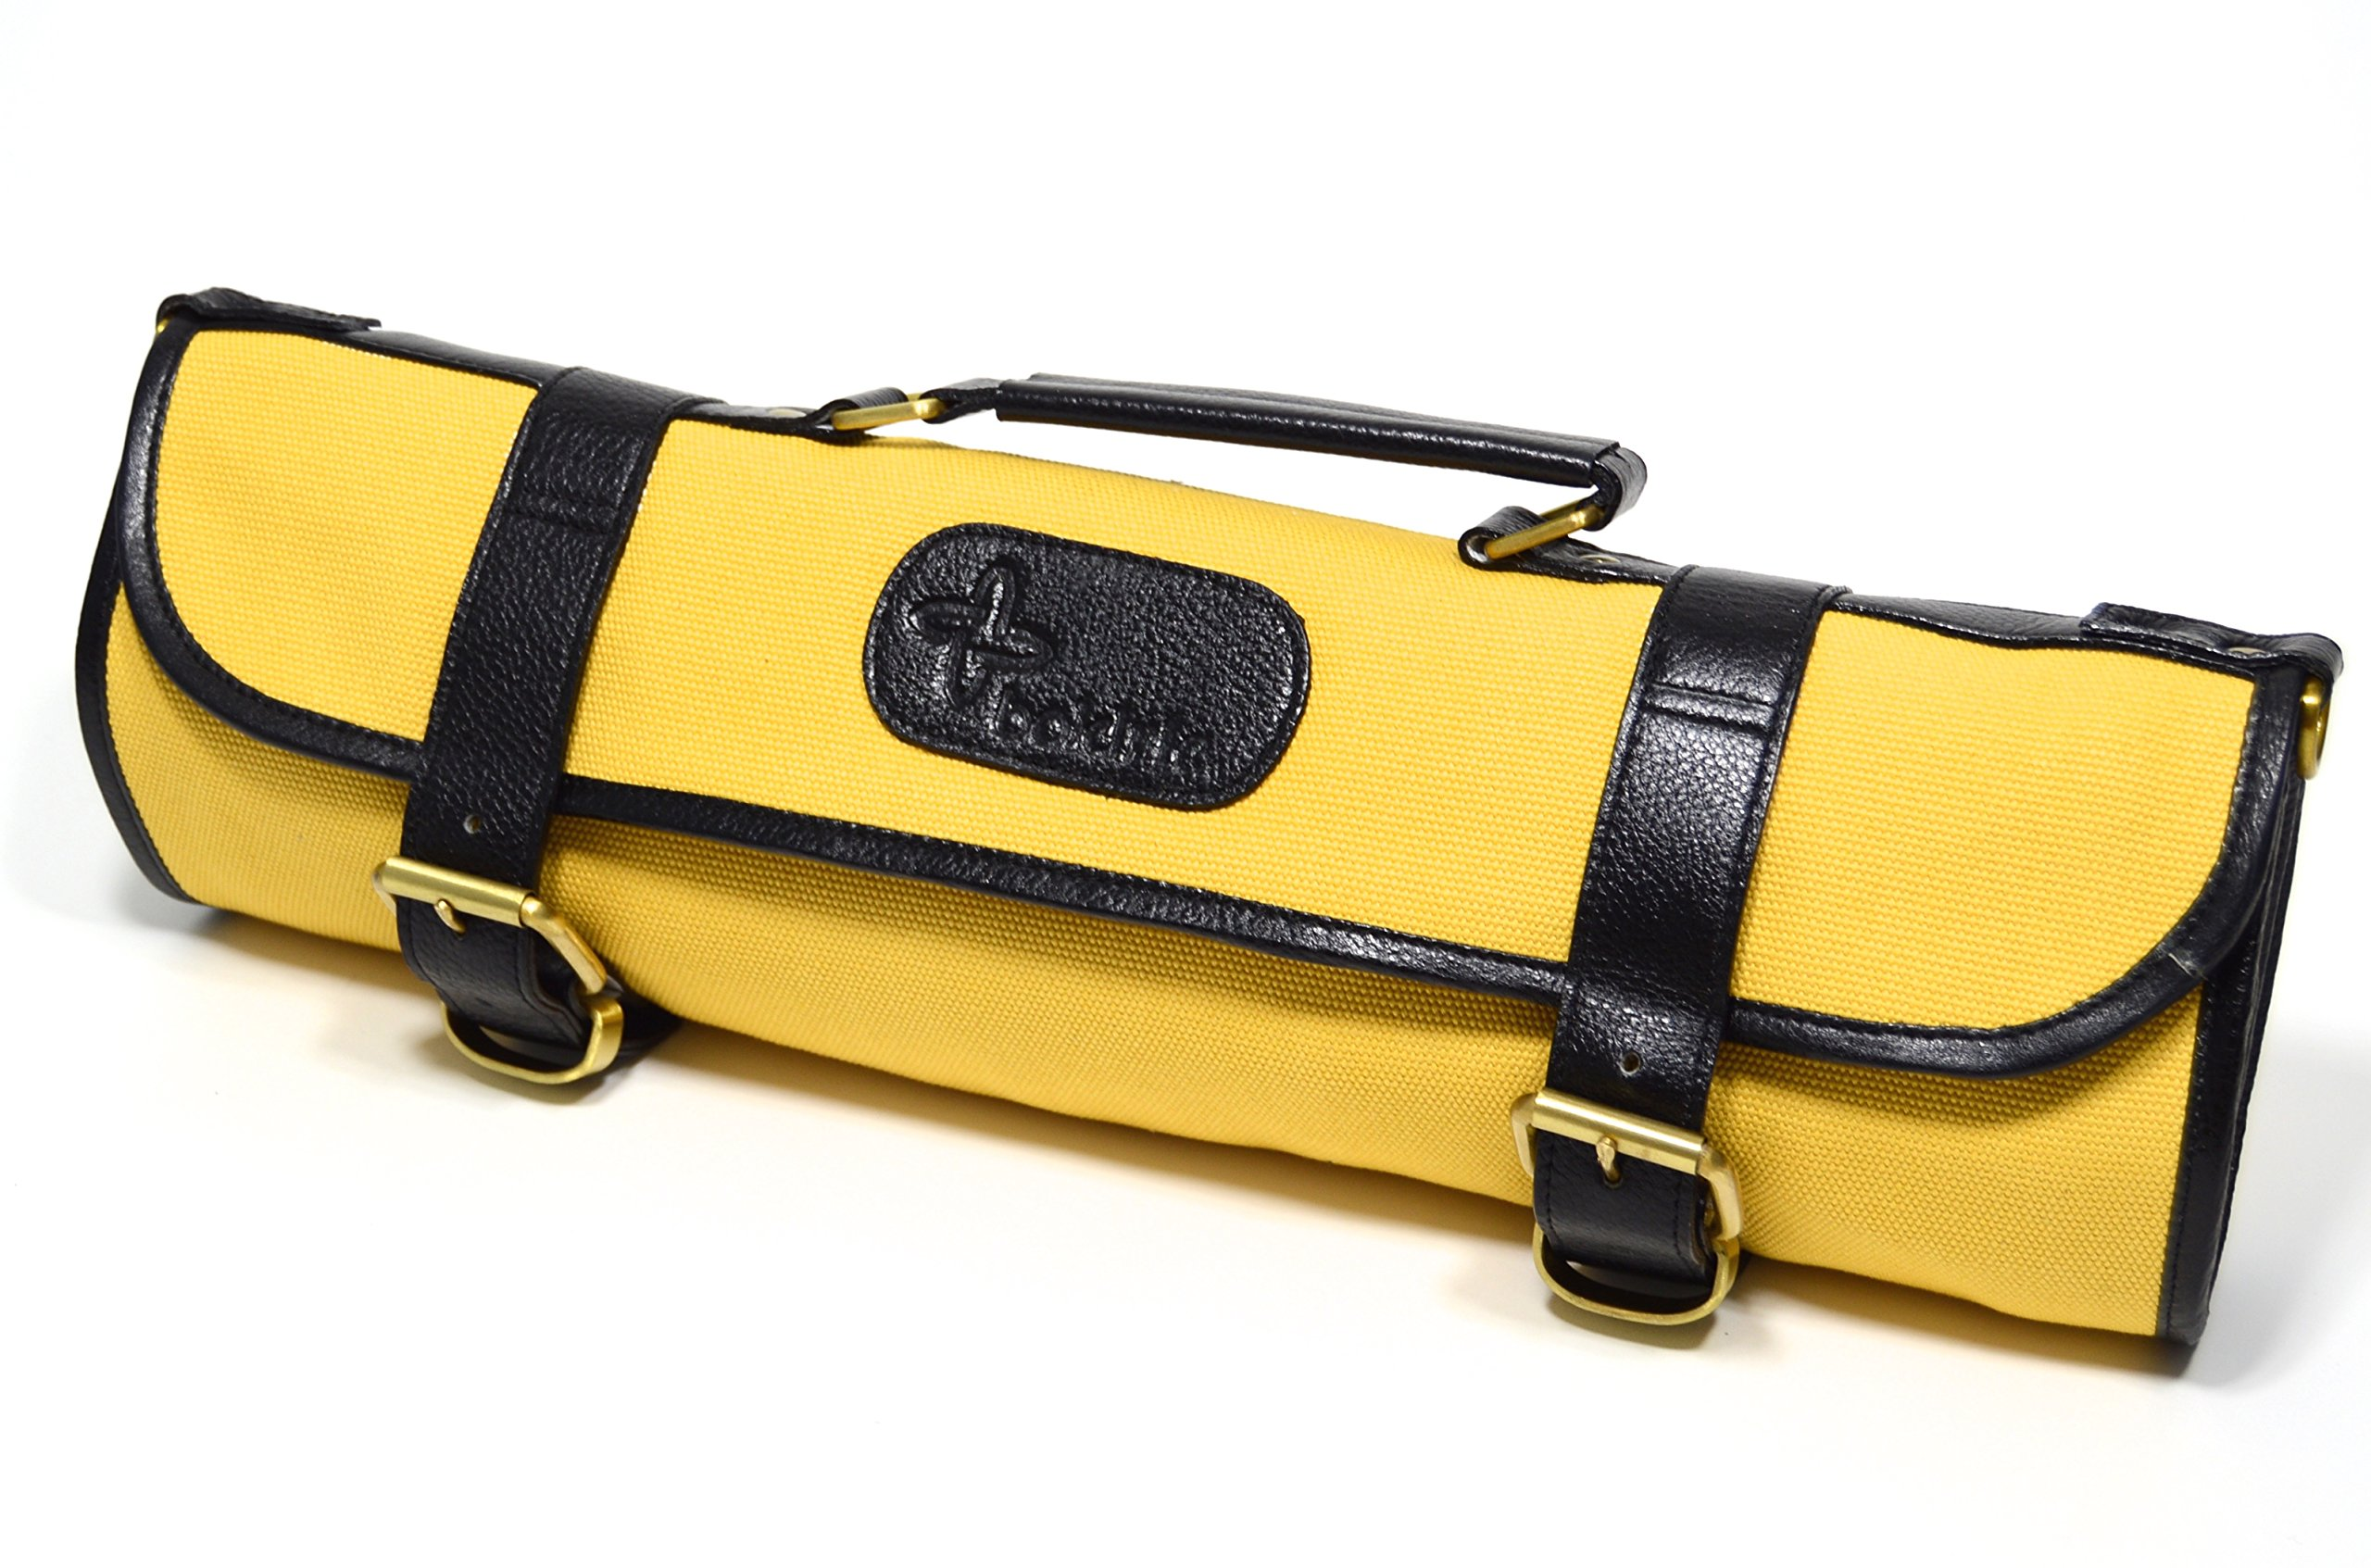 Boldric 9 pocket Canvas Roll Knife Bag Yellow